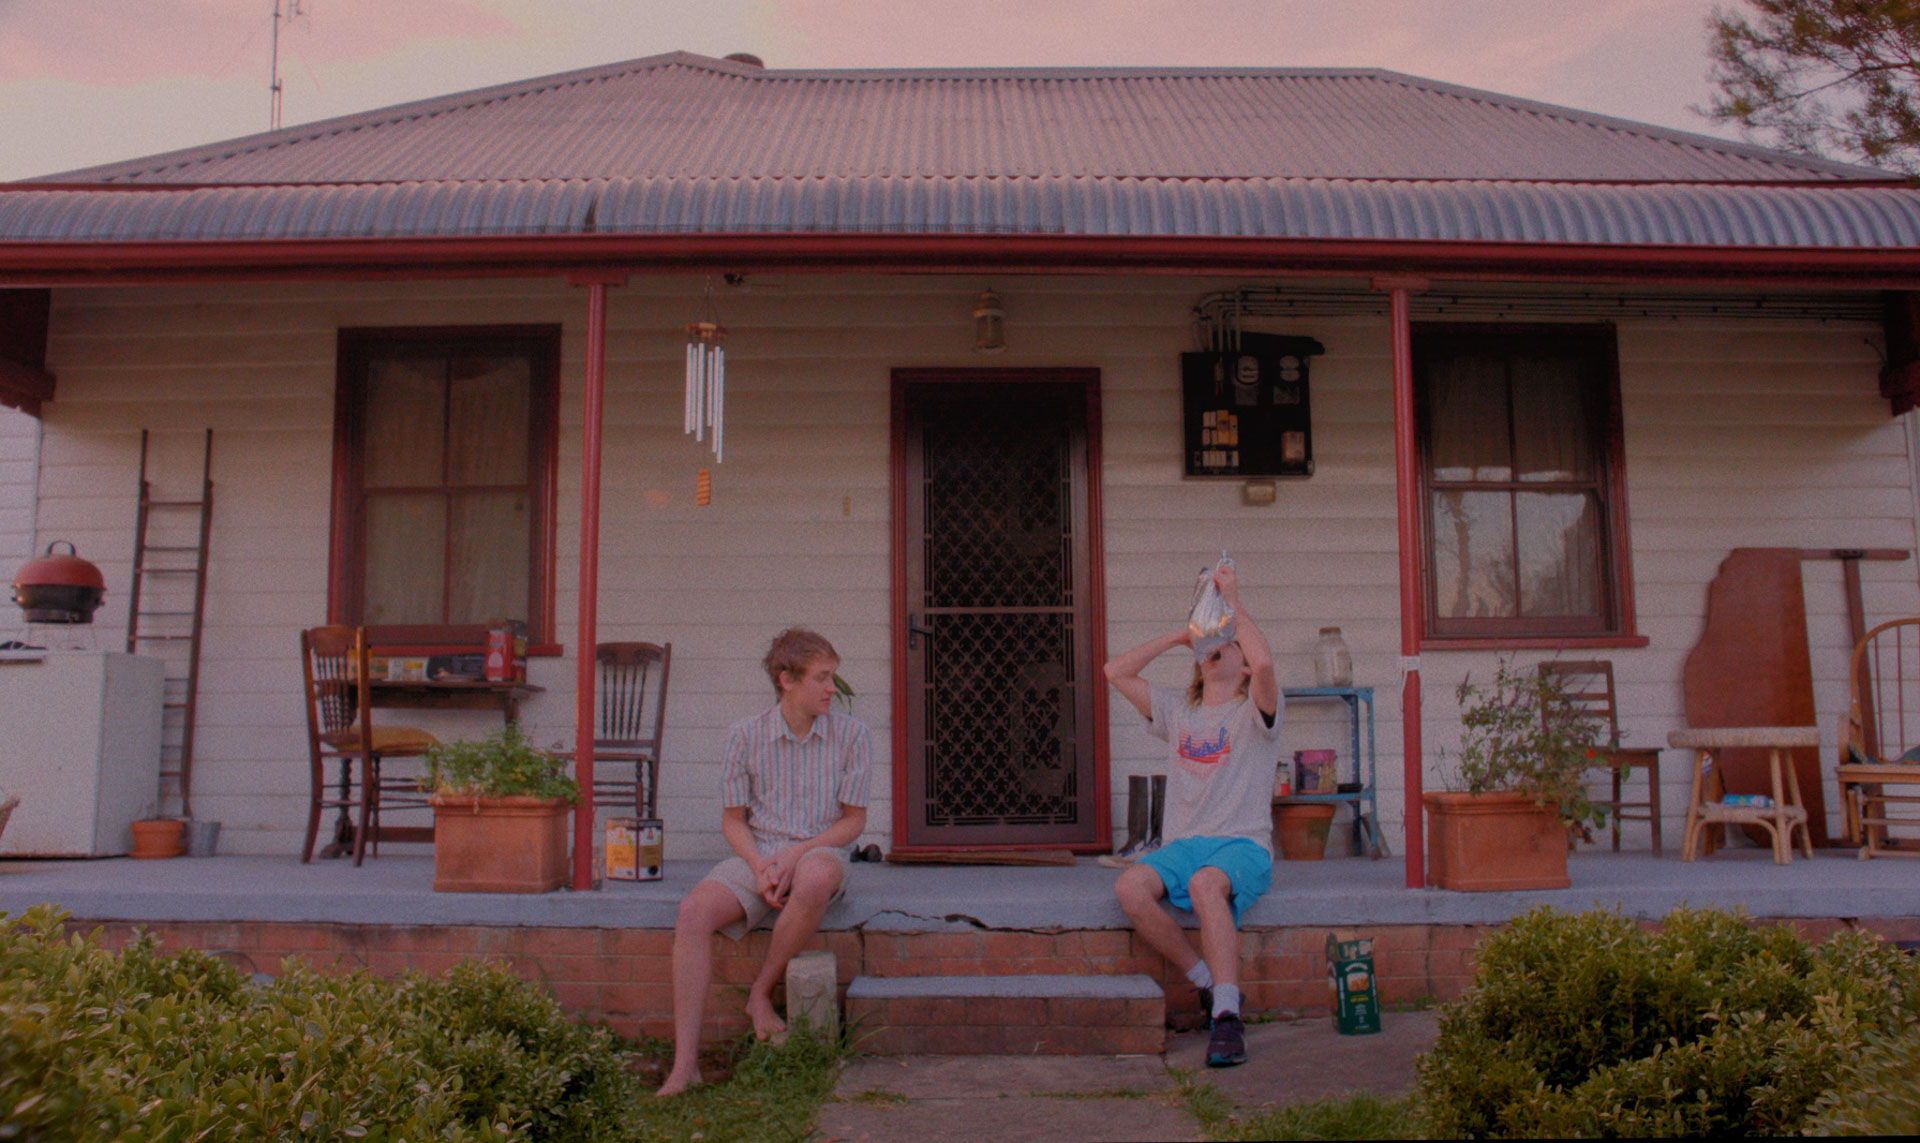 SUMMER GOON | SHORT FILM  Director: Aniqa Mannan  Director of Photography: Dimitri Zaunders   MORE